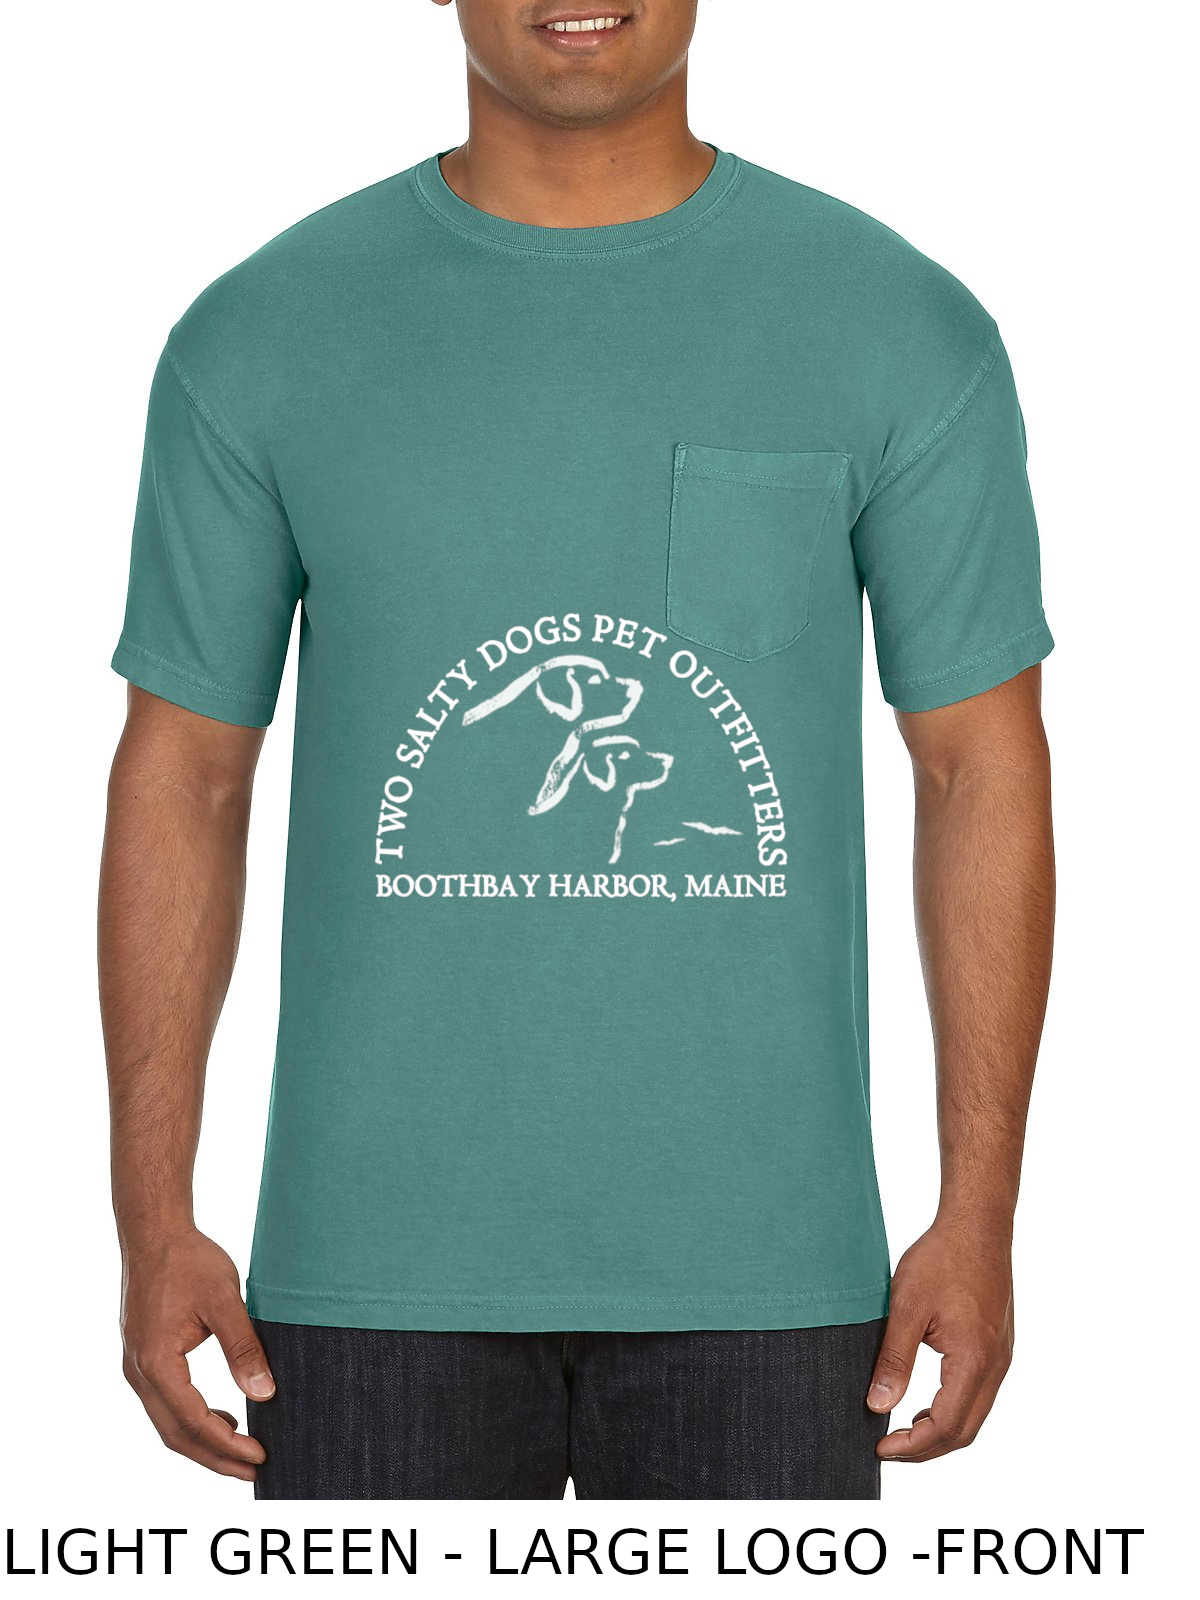 bbha-ss-t-shirt-pocket-light-green-front